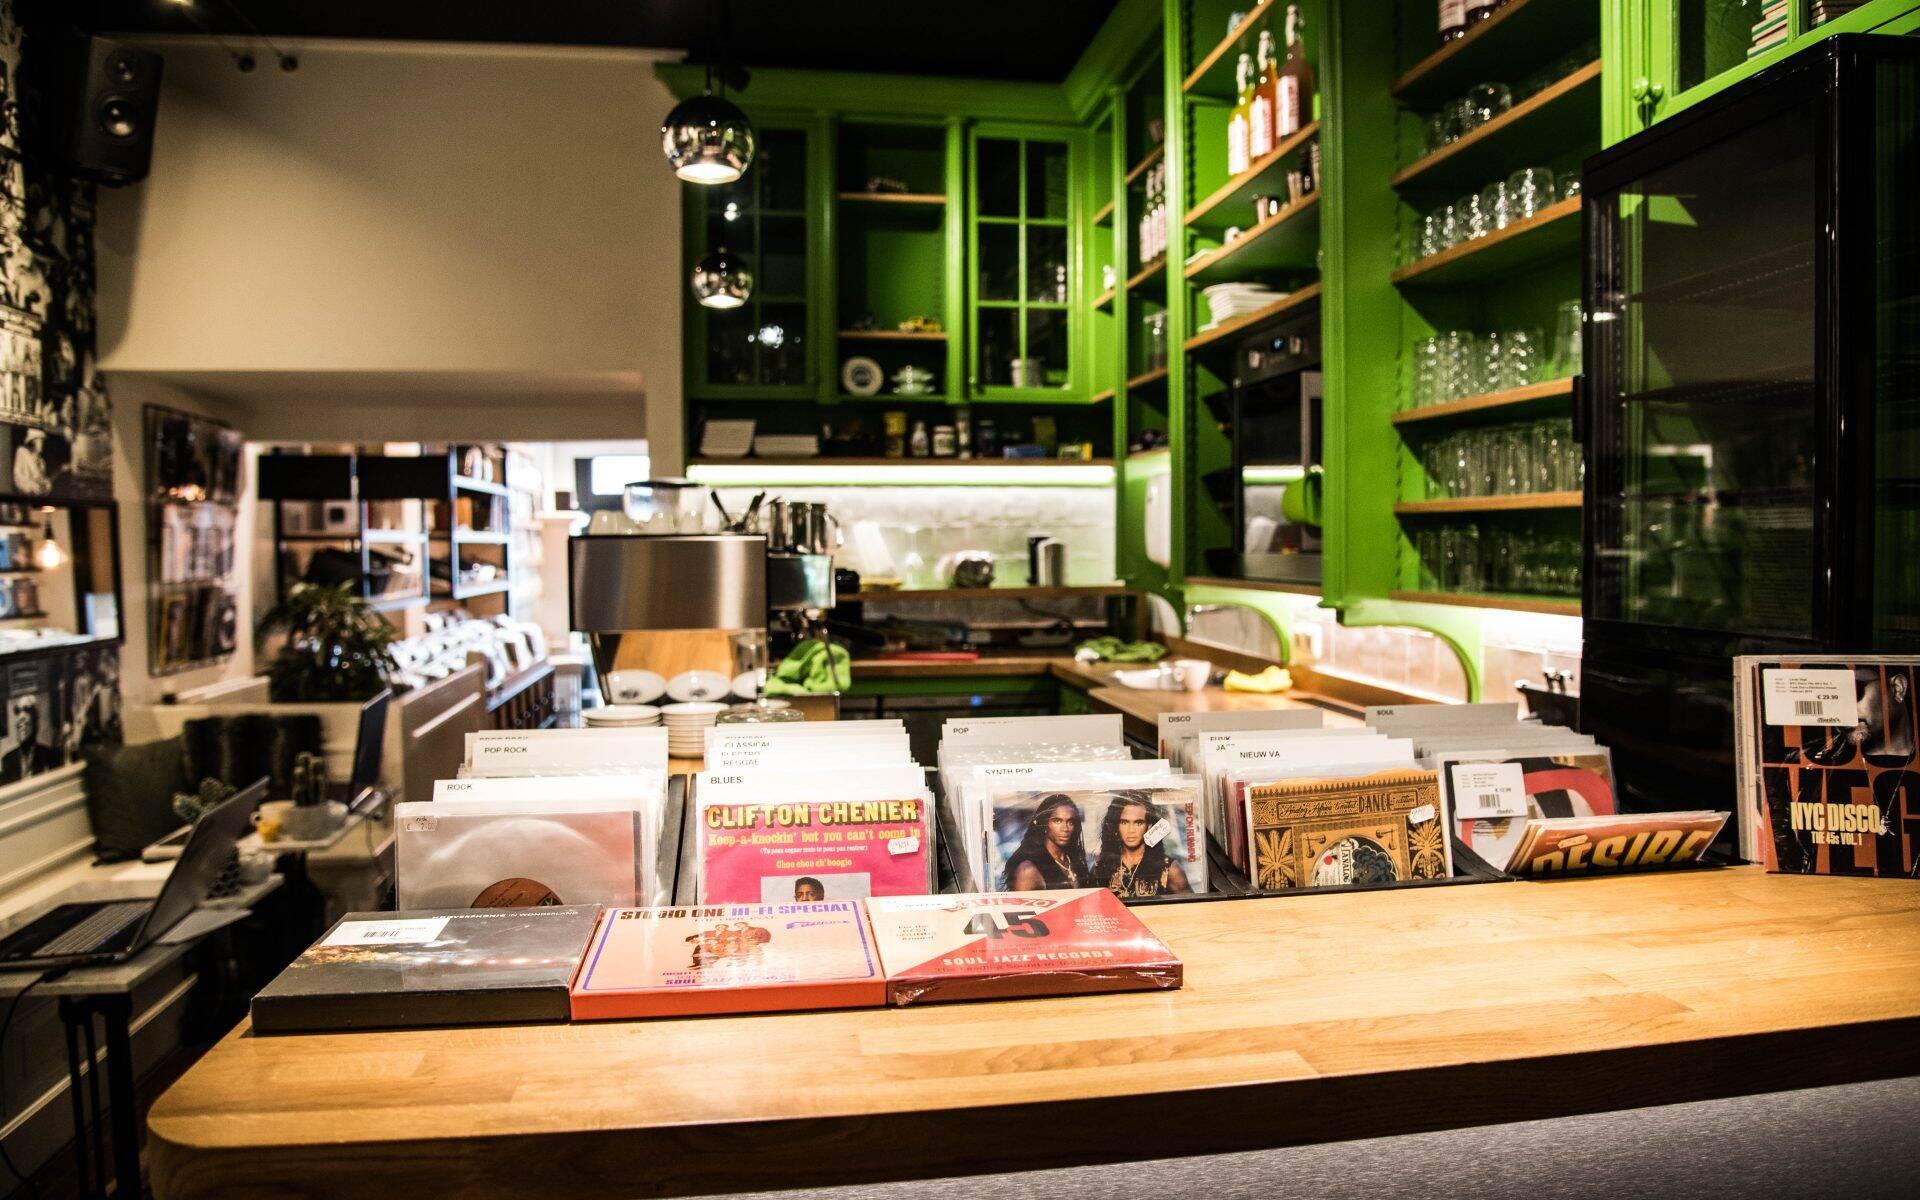 Maestro's Records 's-Hertogenbosch